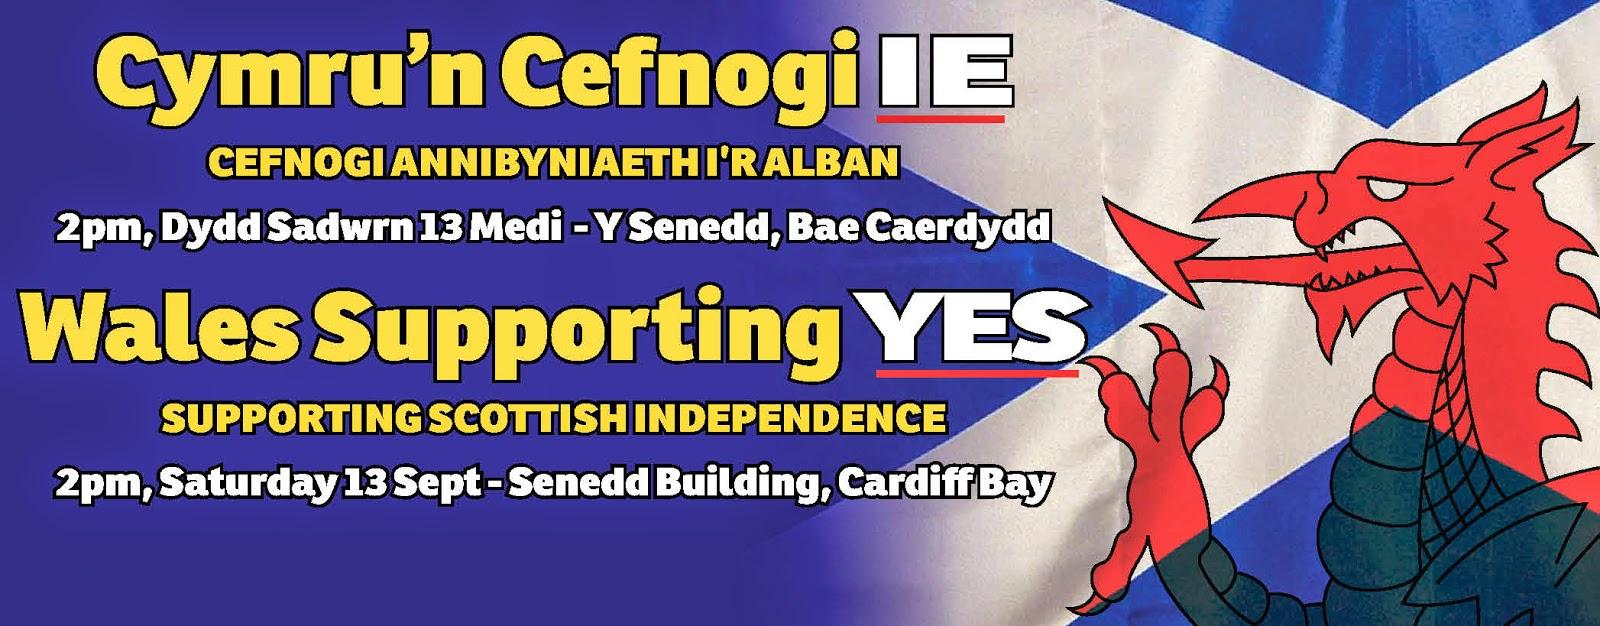 Scotland%2BYes%2B784x295.jpg